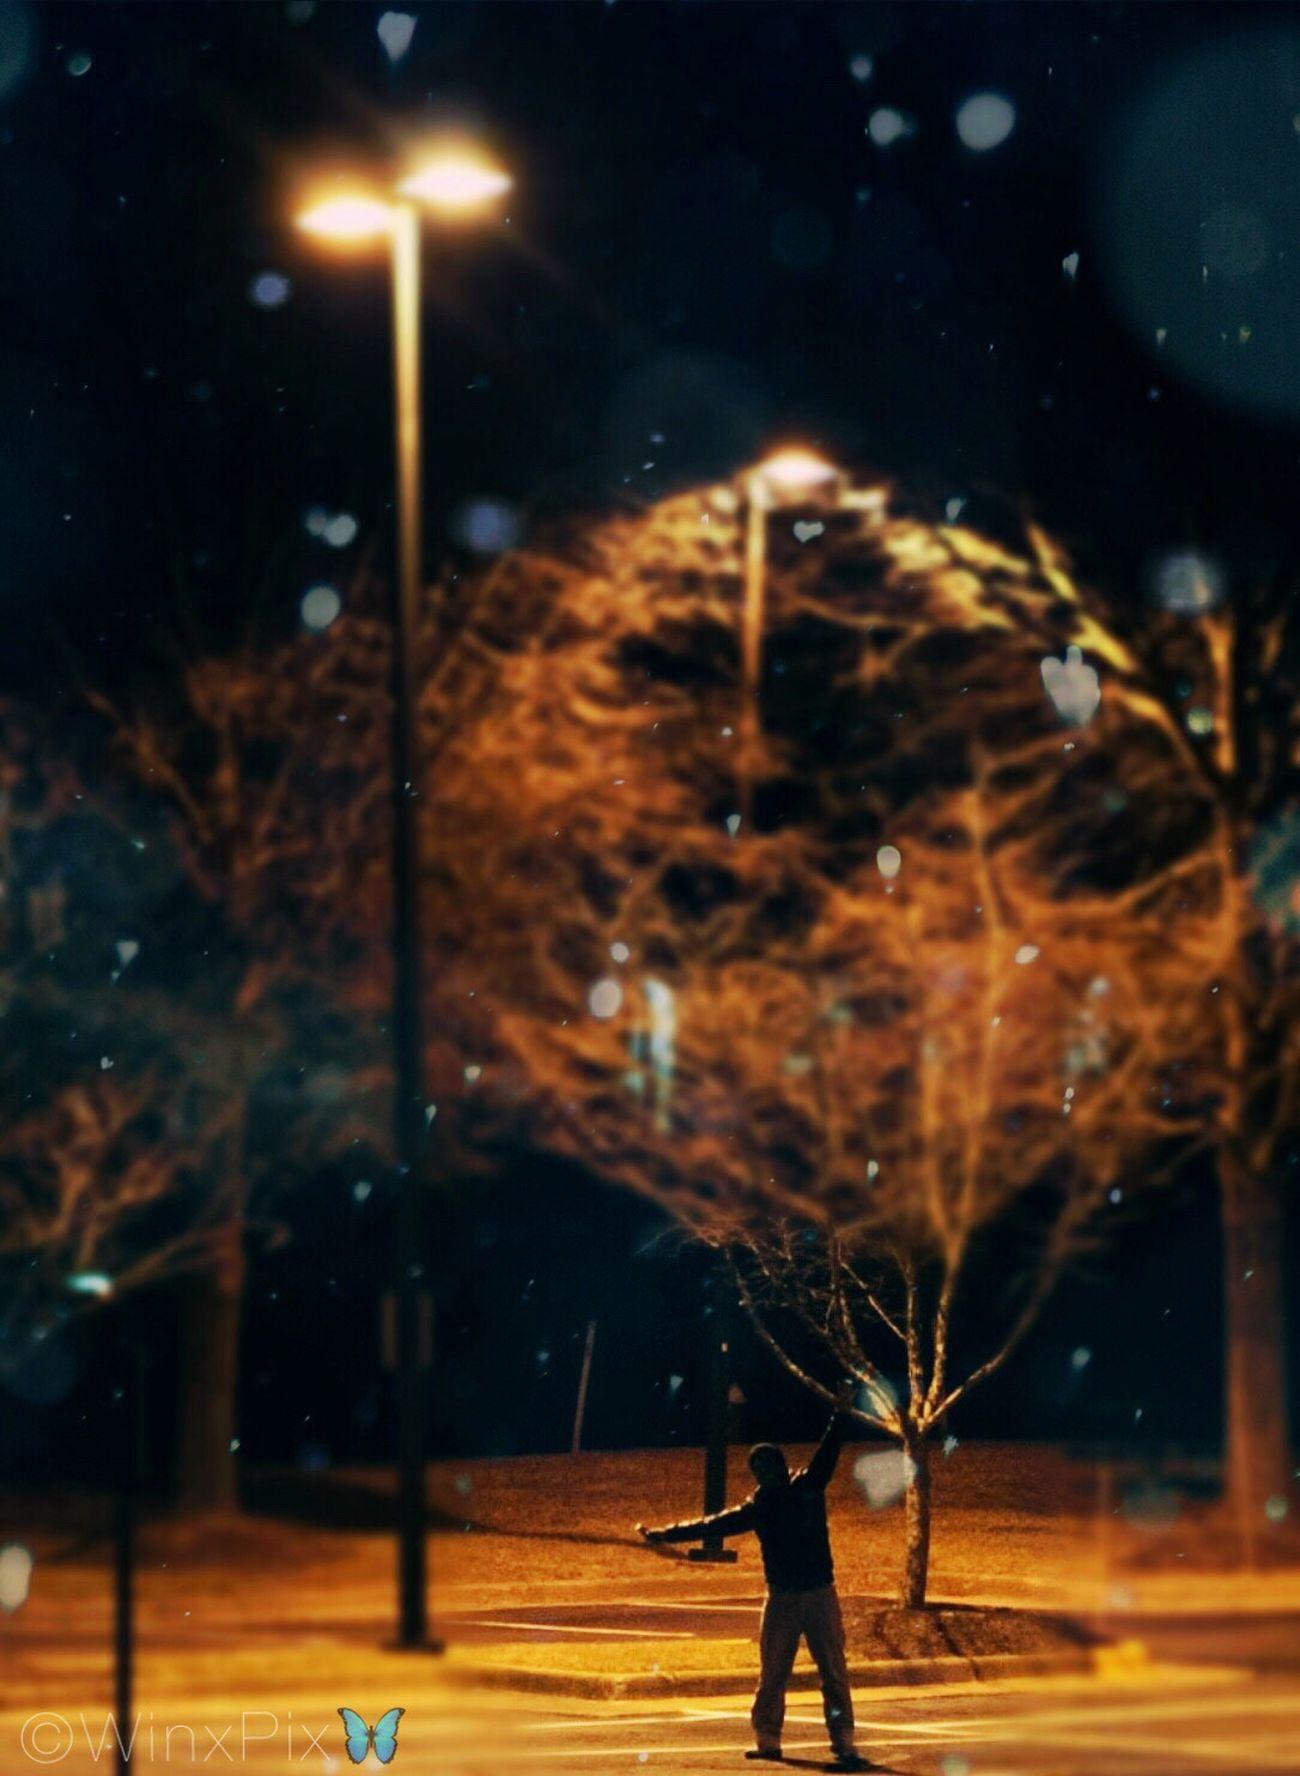 """Photo bomb"". 16/120. Lowlightphotography One Person Parking Area Parking Lot Photobomb Photobombed Photobomber EyeEmNewHere"